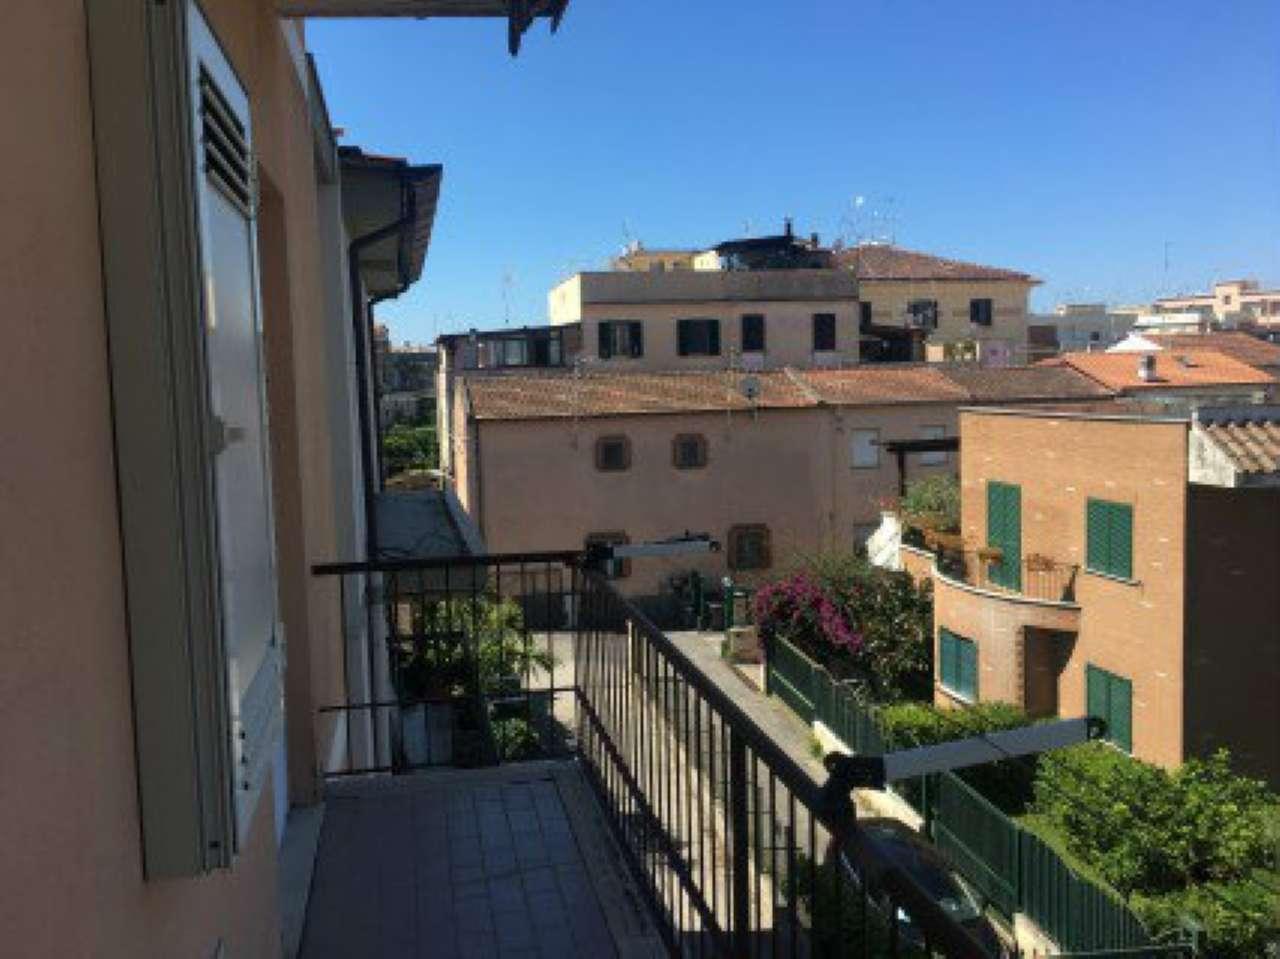 Bilocale, Via Don Morosini, Terracina, foto 11